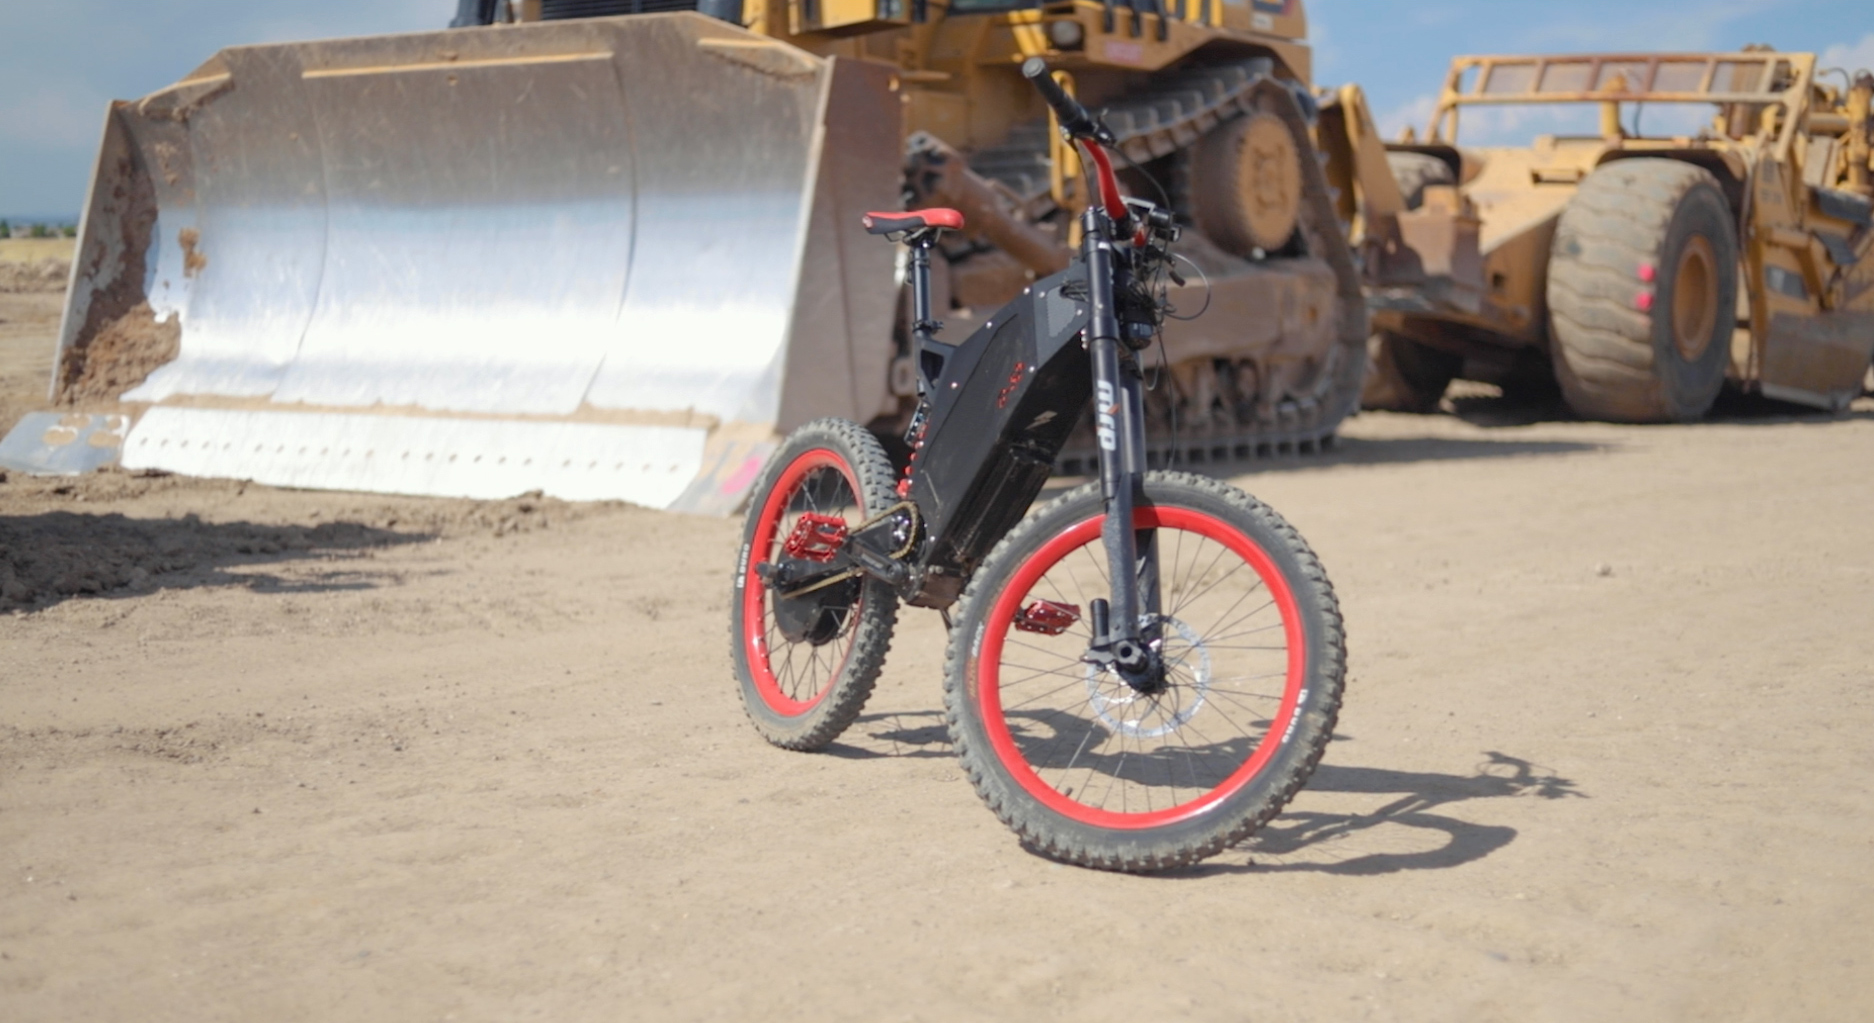 electrified-reviews-stealth-b52-bomber-electric-bike-review-profile-4.jpg